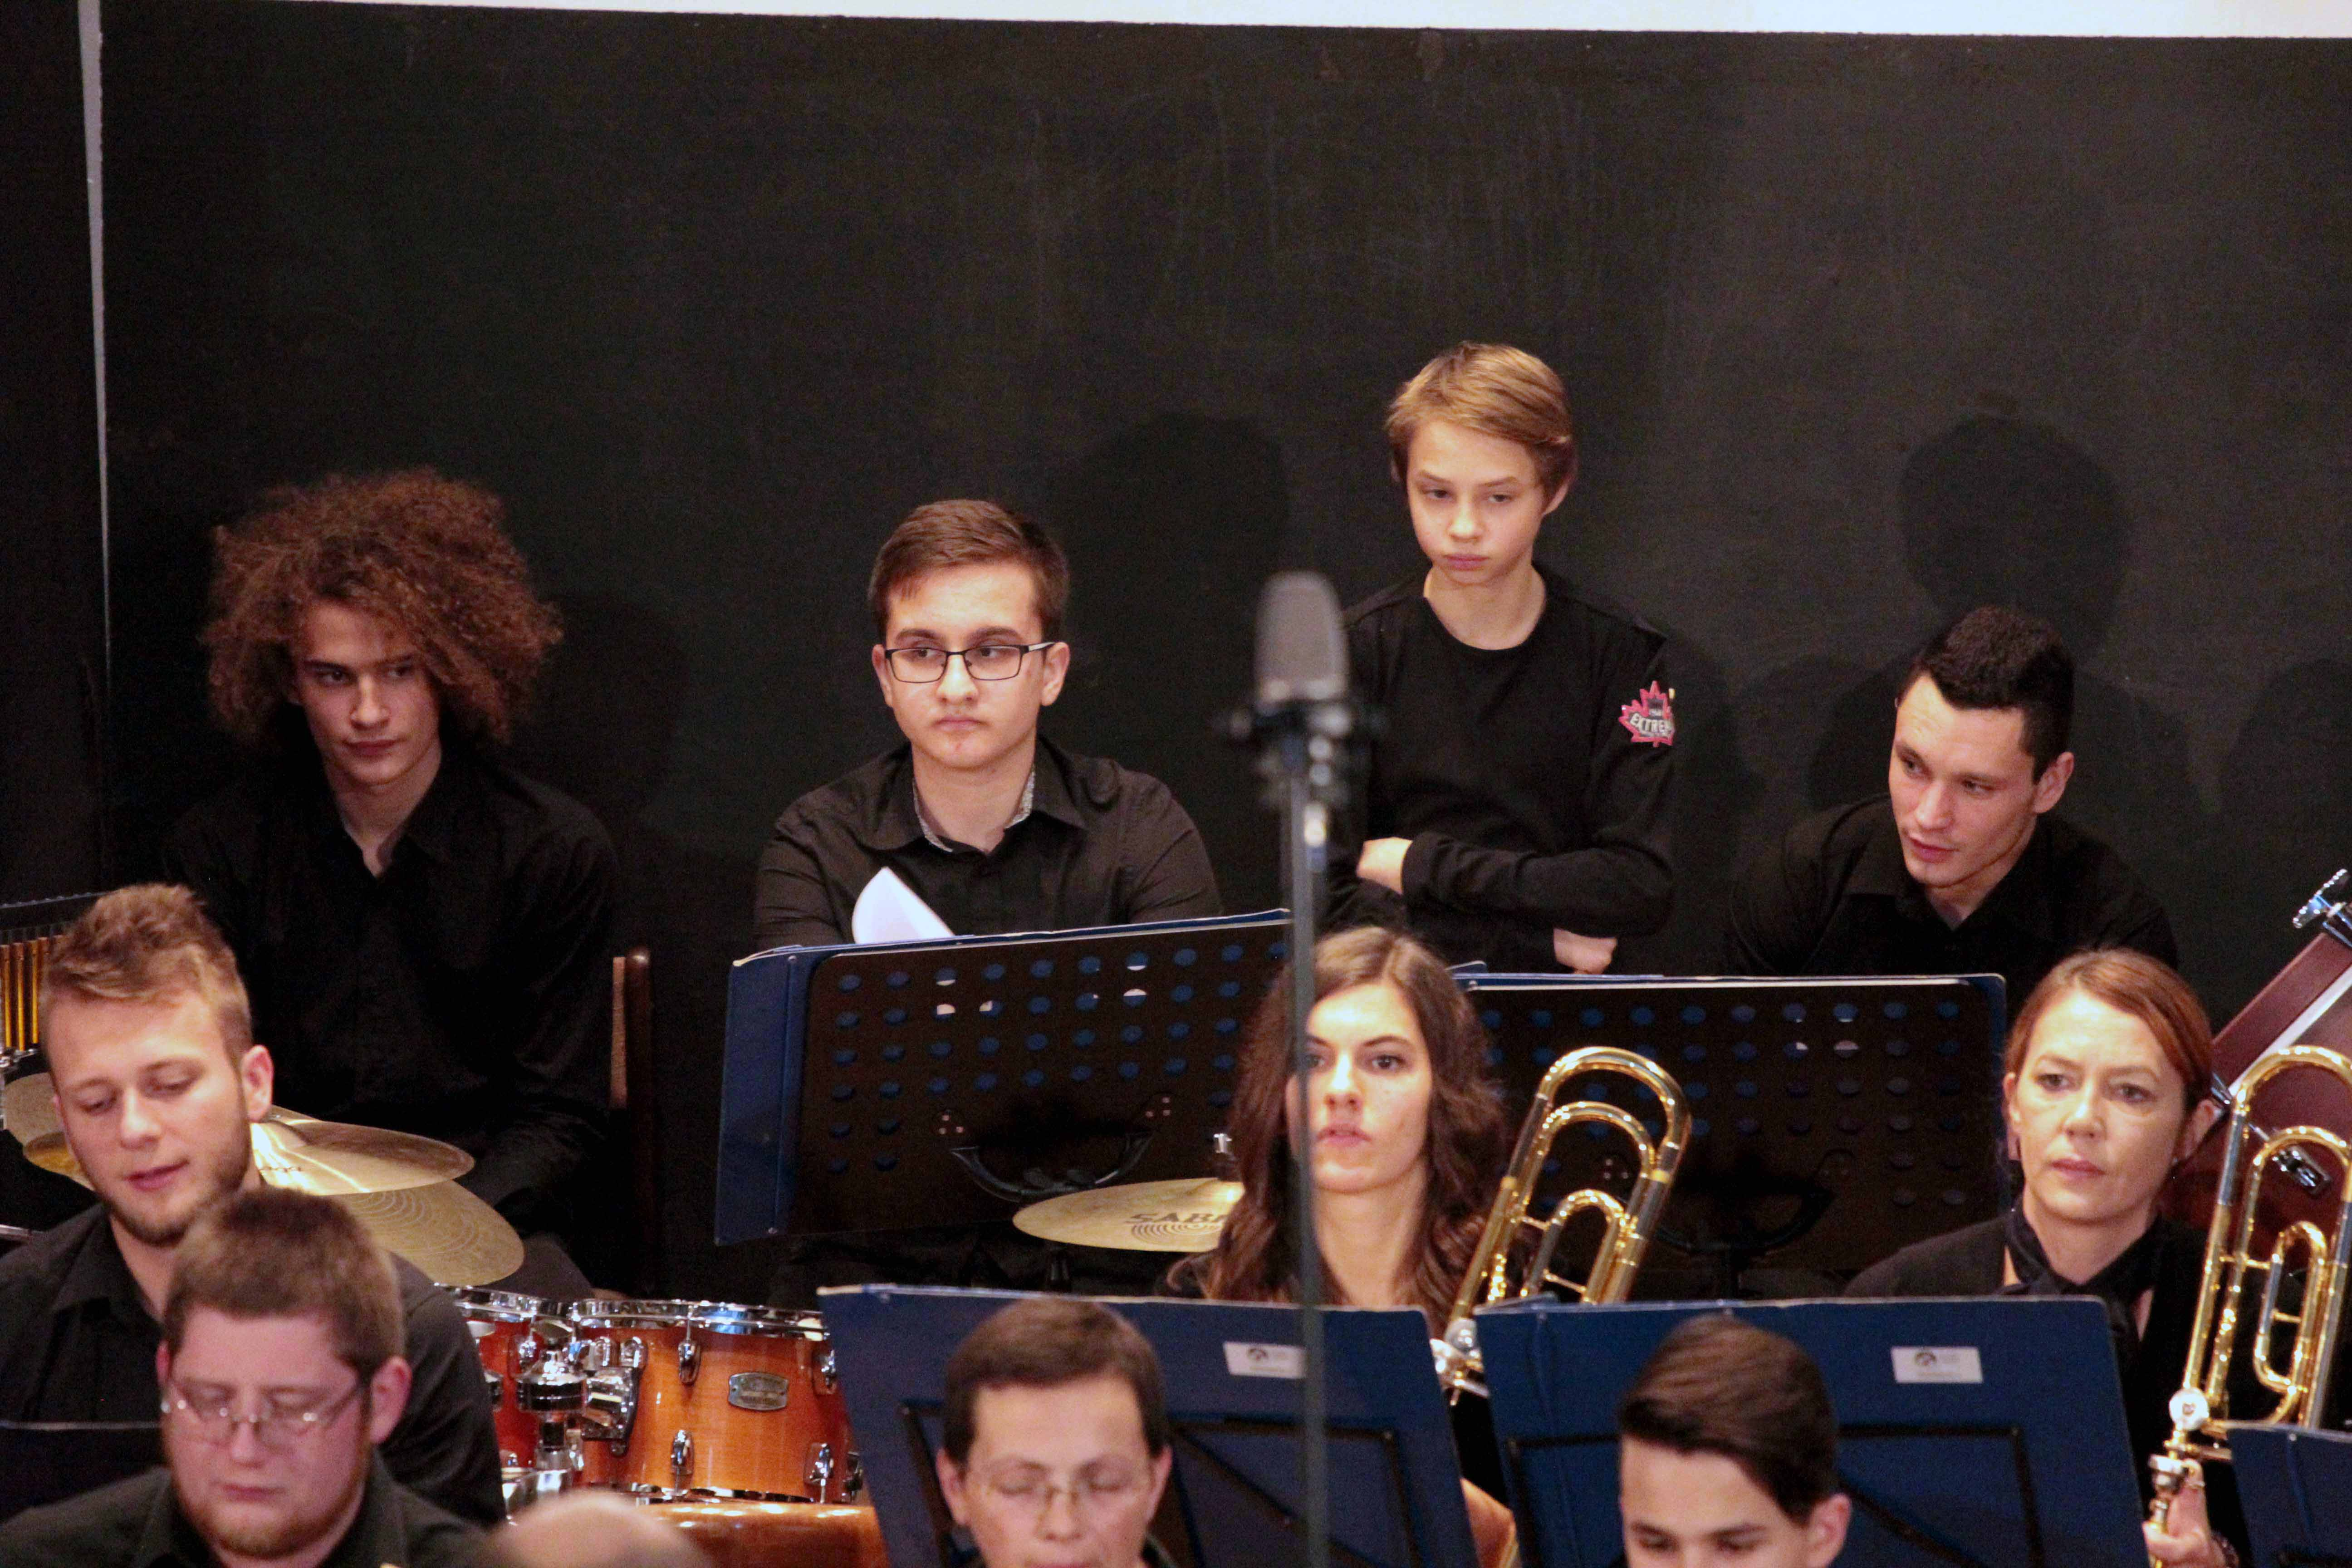 3-godisnji-koncert-puhacki-orkestar-2016-by-milan-mimi-petic